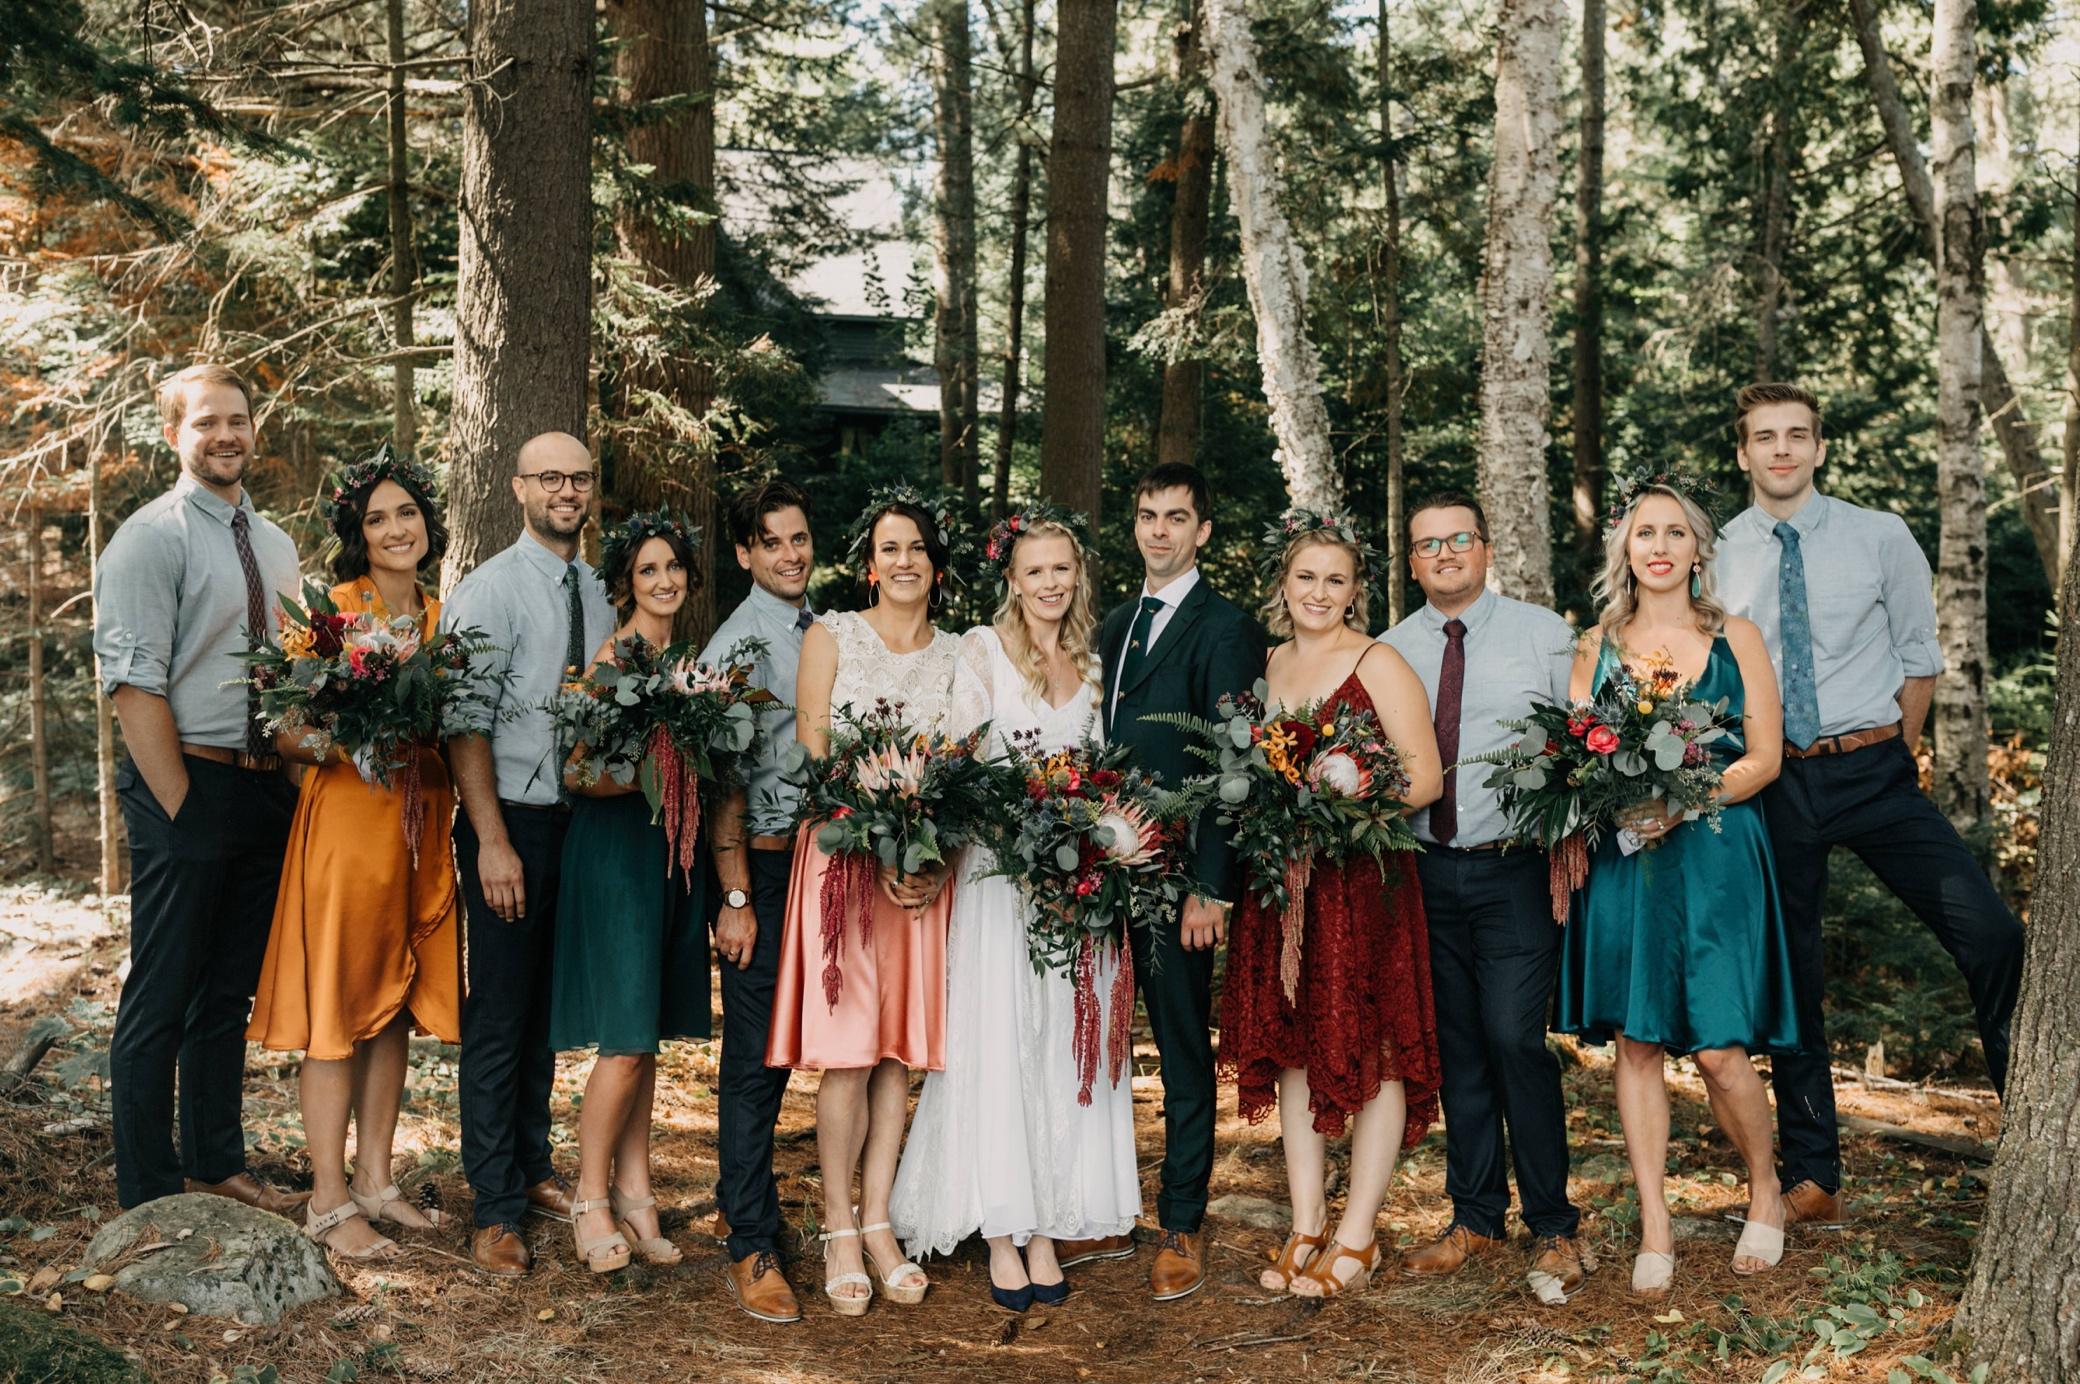 047_Huntsville Wedding  (177 of 689).jpg